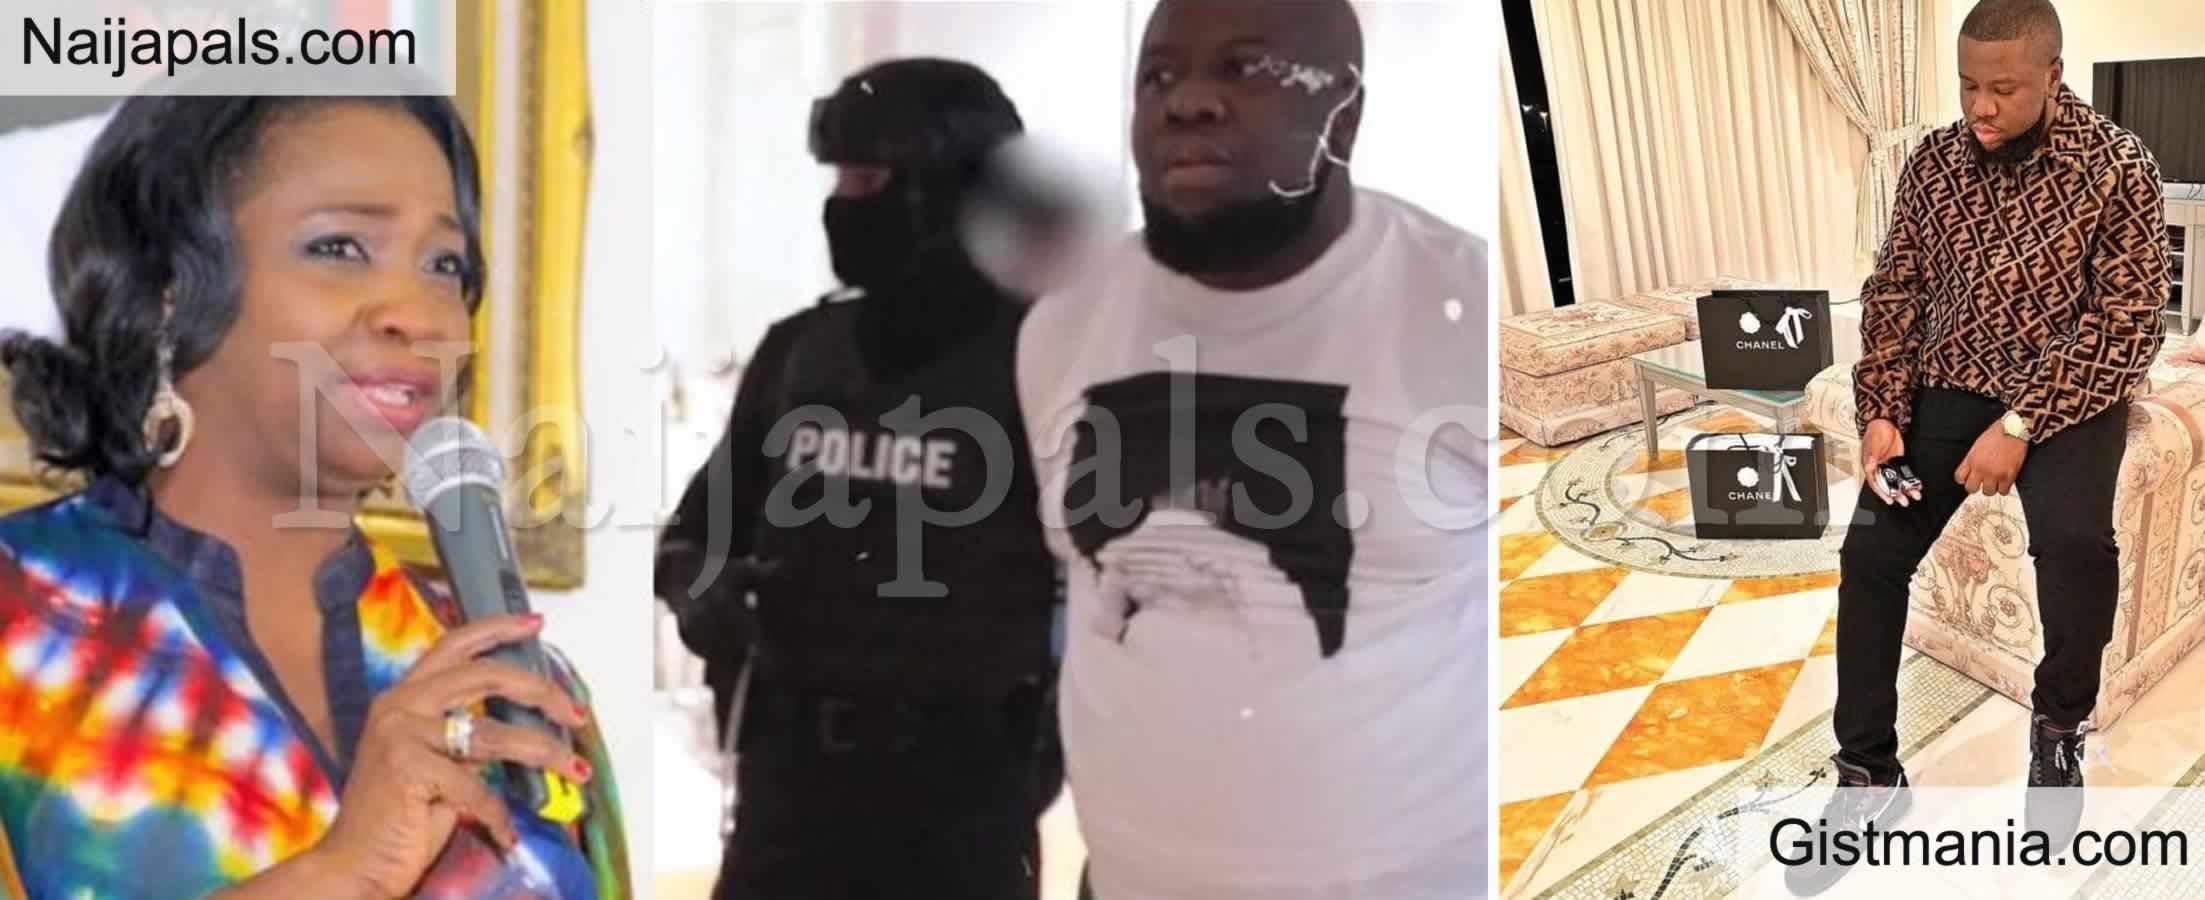 "<img alt='.' class='lazyload' data-src='https://img.gistmania.com/emot/comment.gif' /> <b>""Hushpuppi's Fraudulent Saga, Show Off Has Tarnished Nigeria's Image""</b> – Abike Dabiri-Erewa Says"